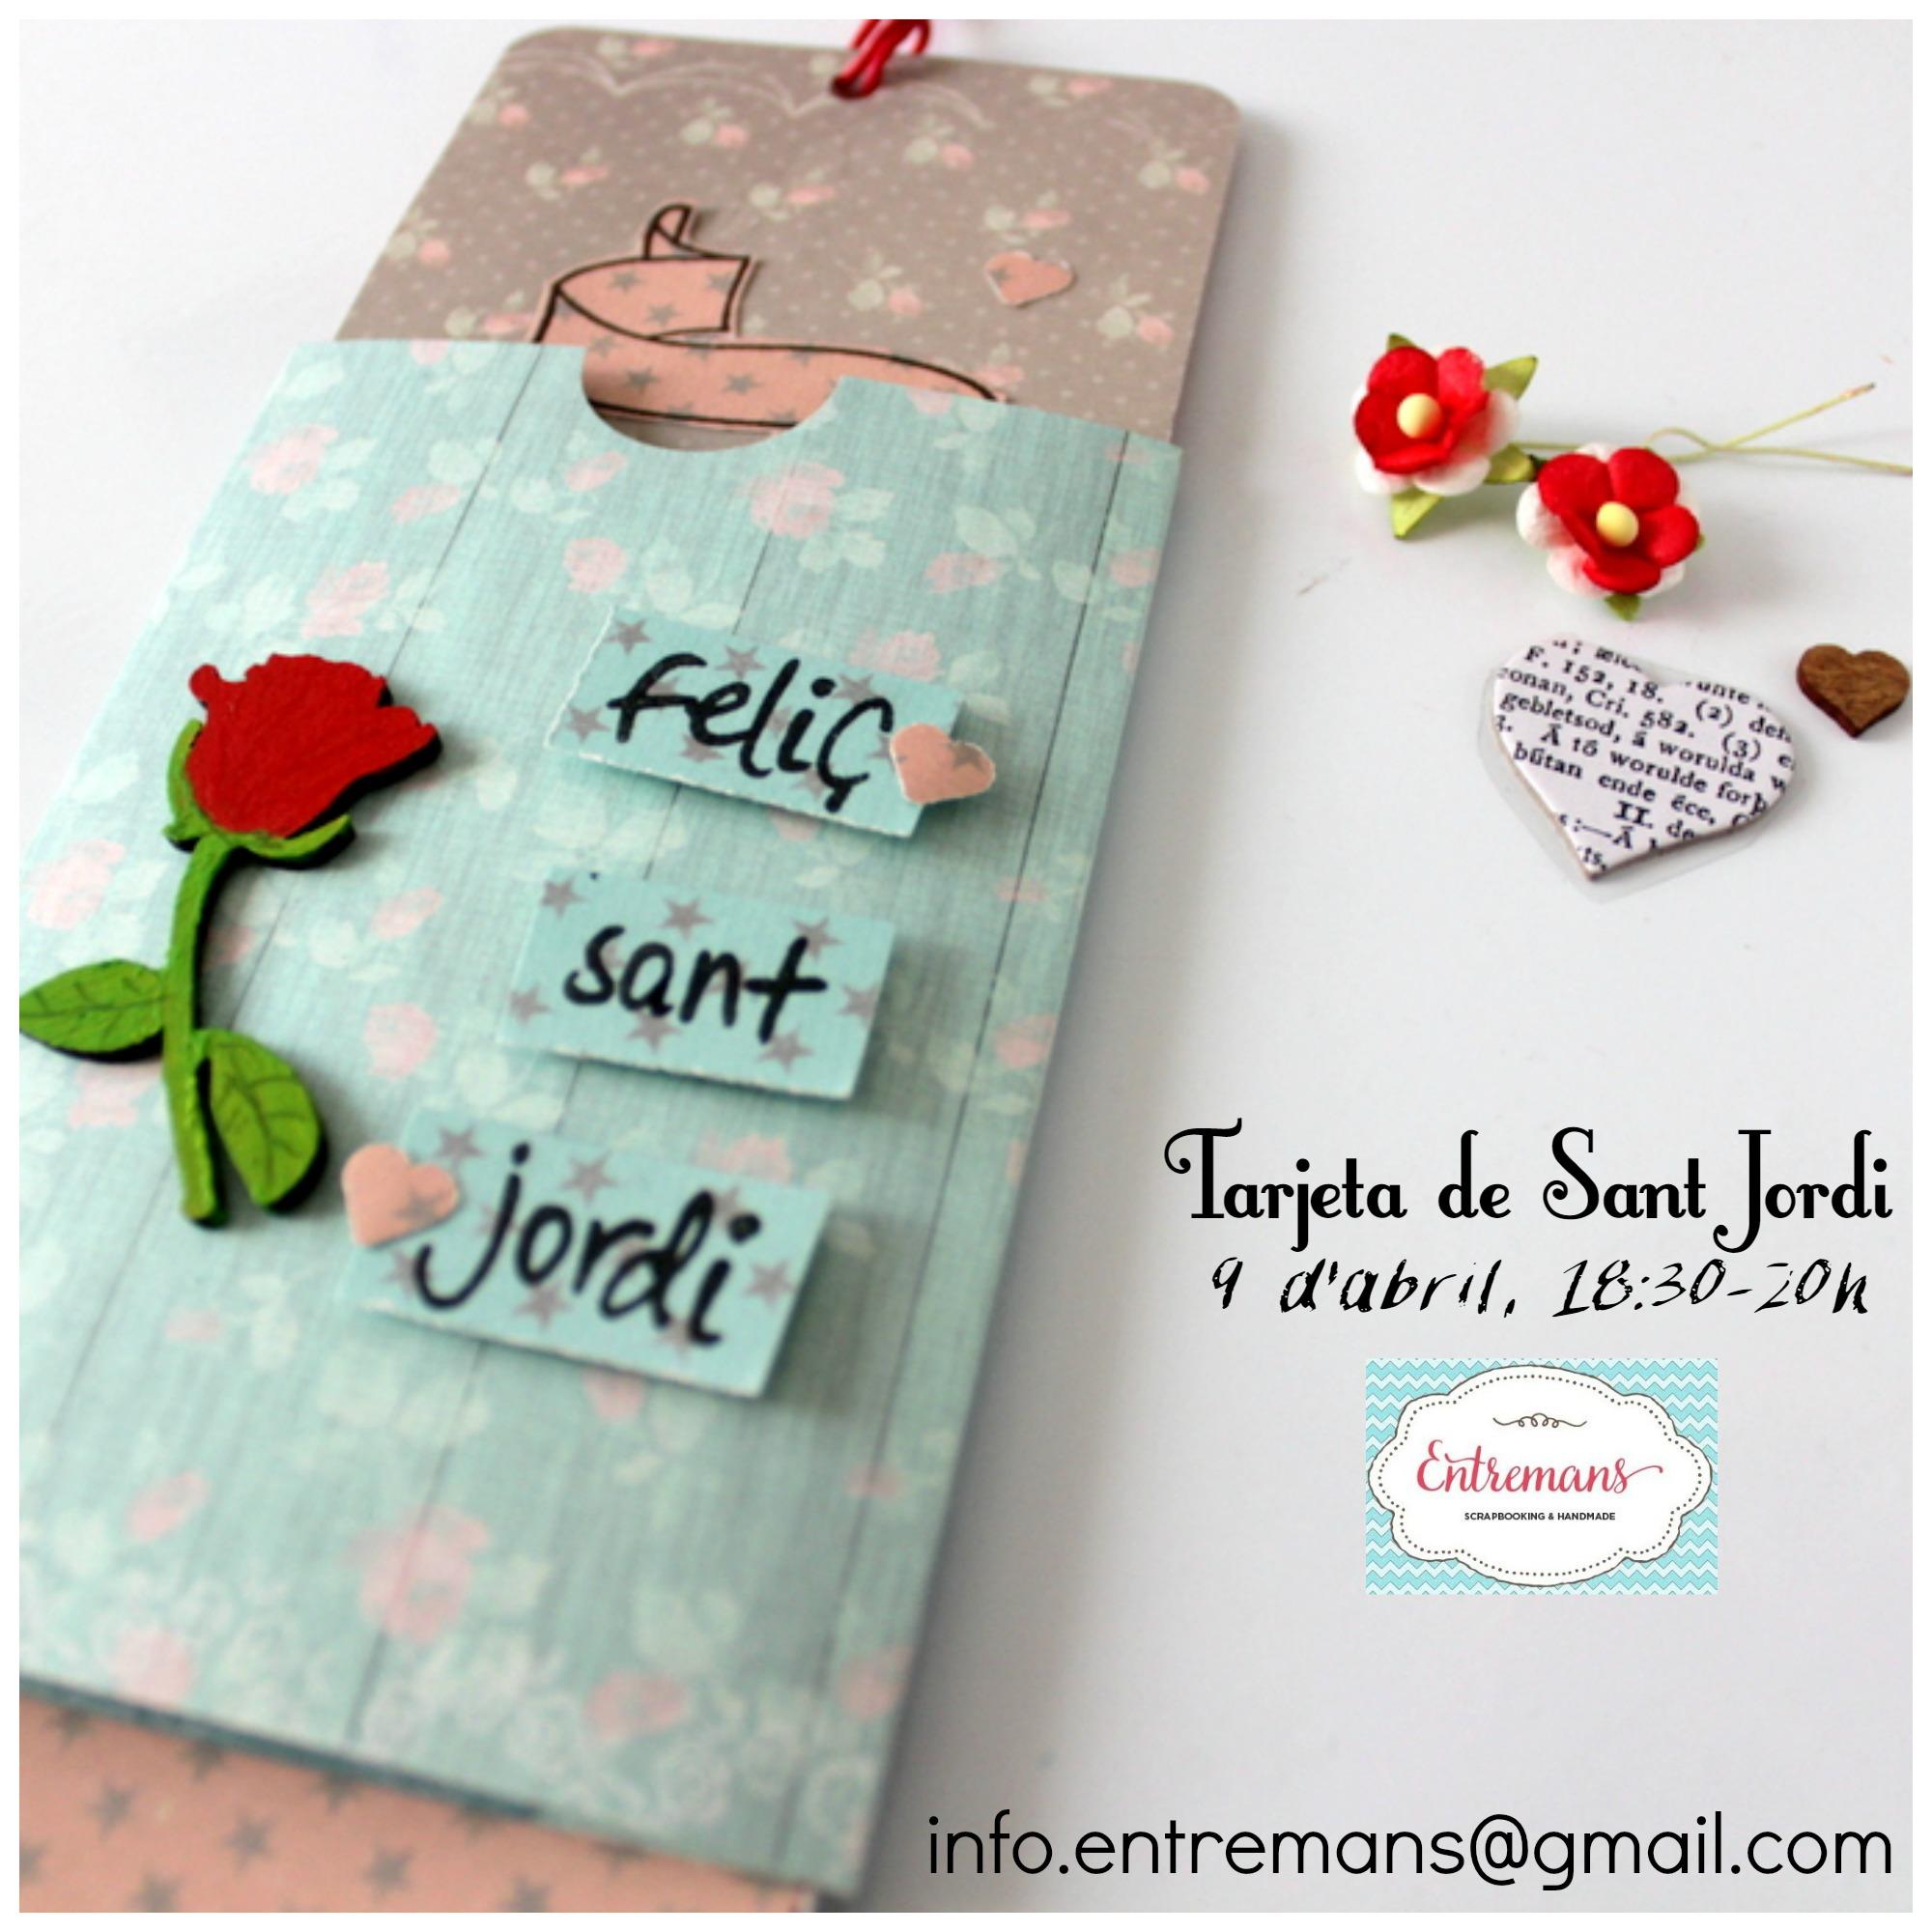 Cartell Taller Sant Jordi Entremans